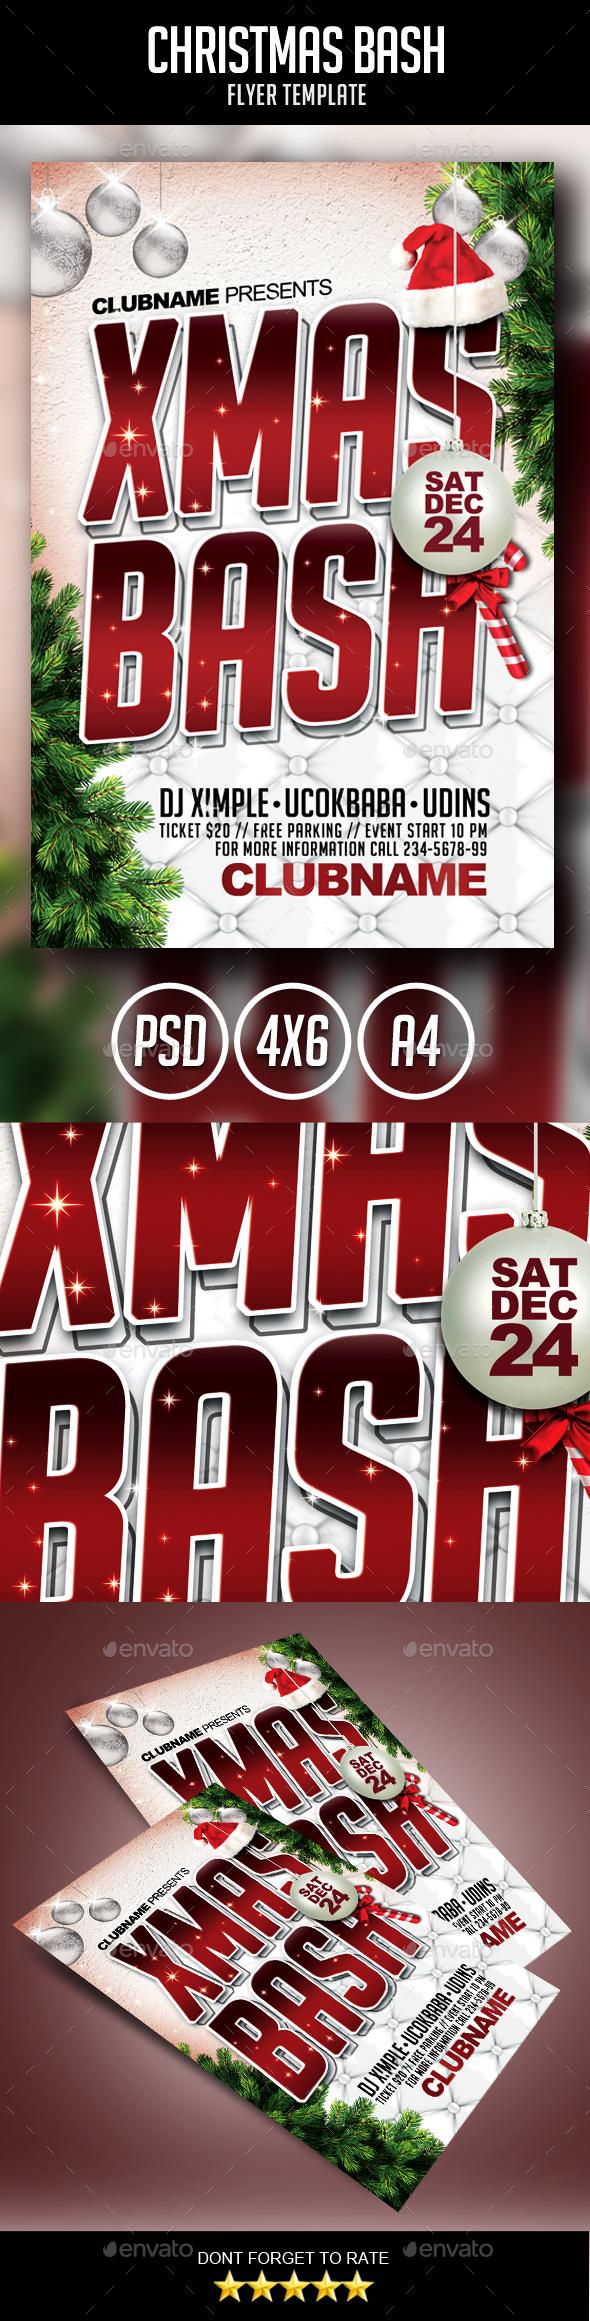 Christmas Bash Flyer - Holidays Events